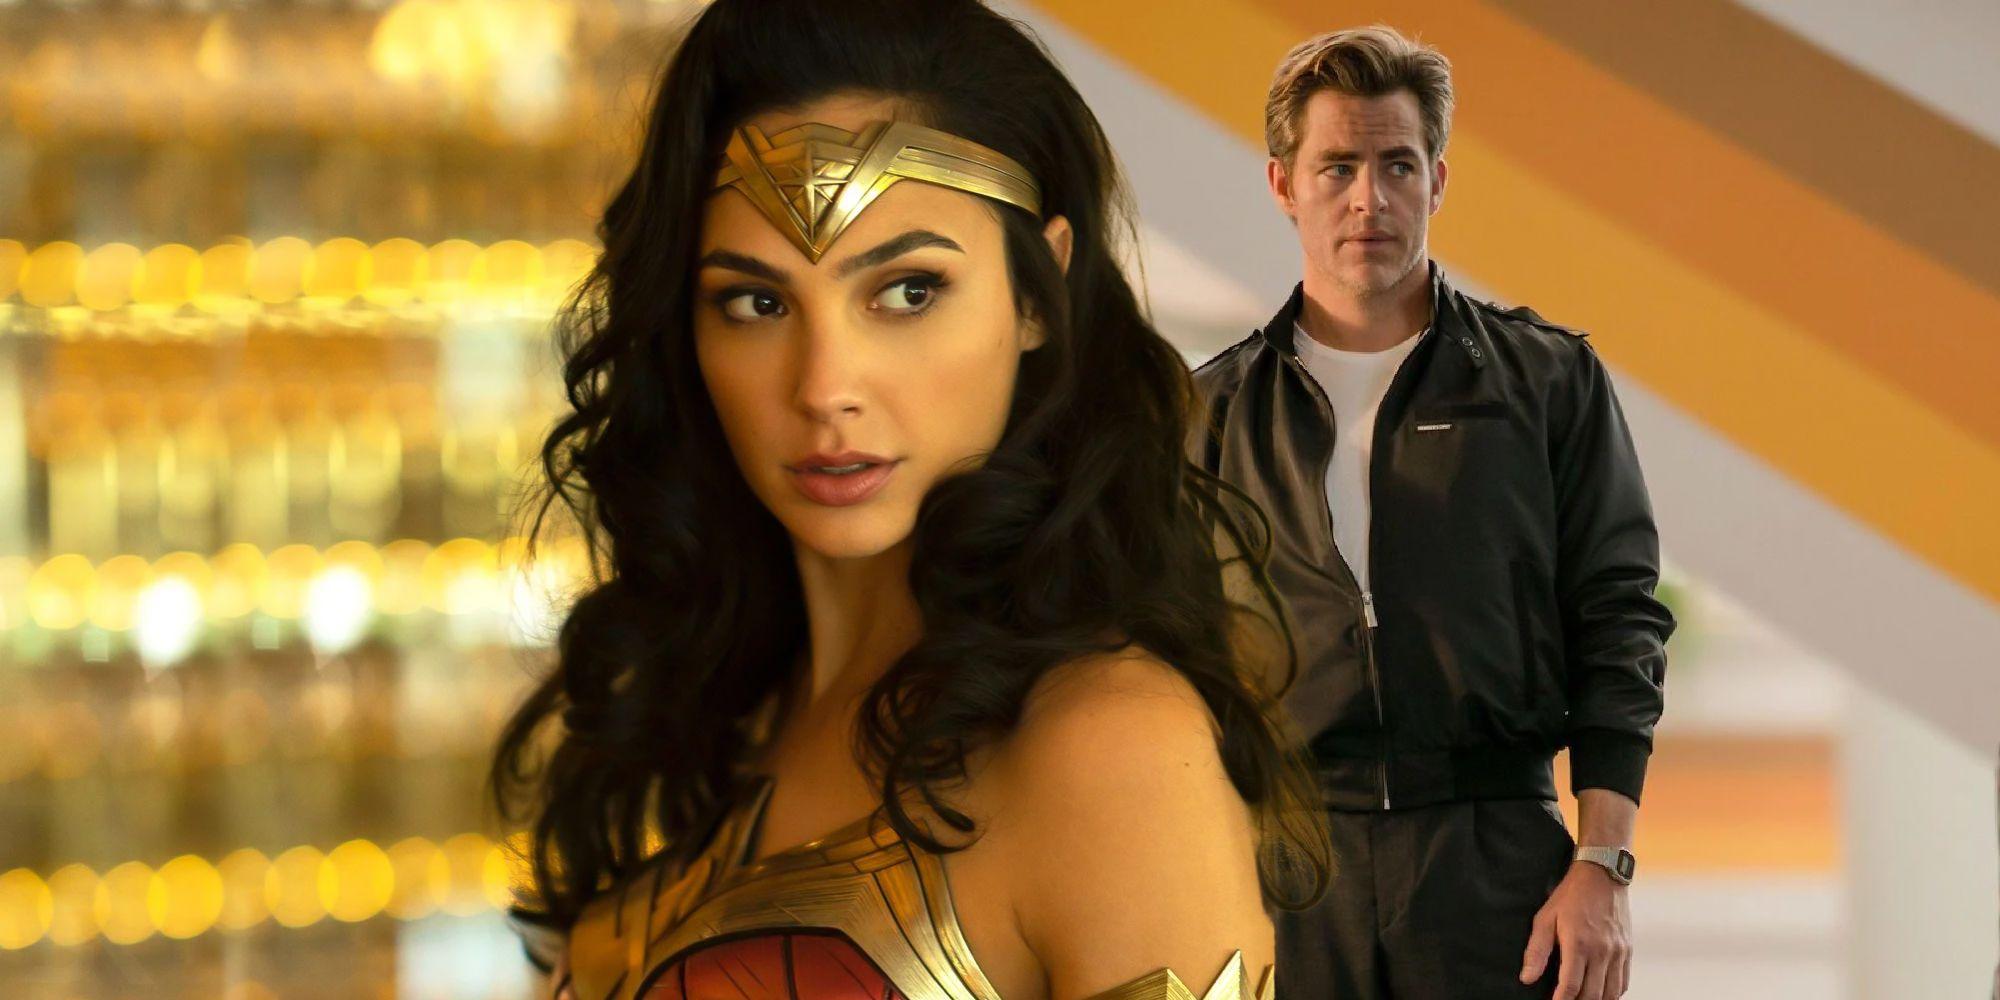 Wonder Woman 1984 Theory: Steve Trevor Is Still Alive In The DCEU